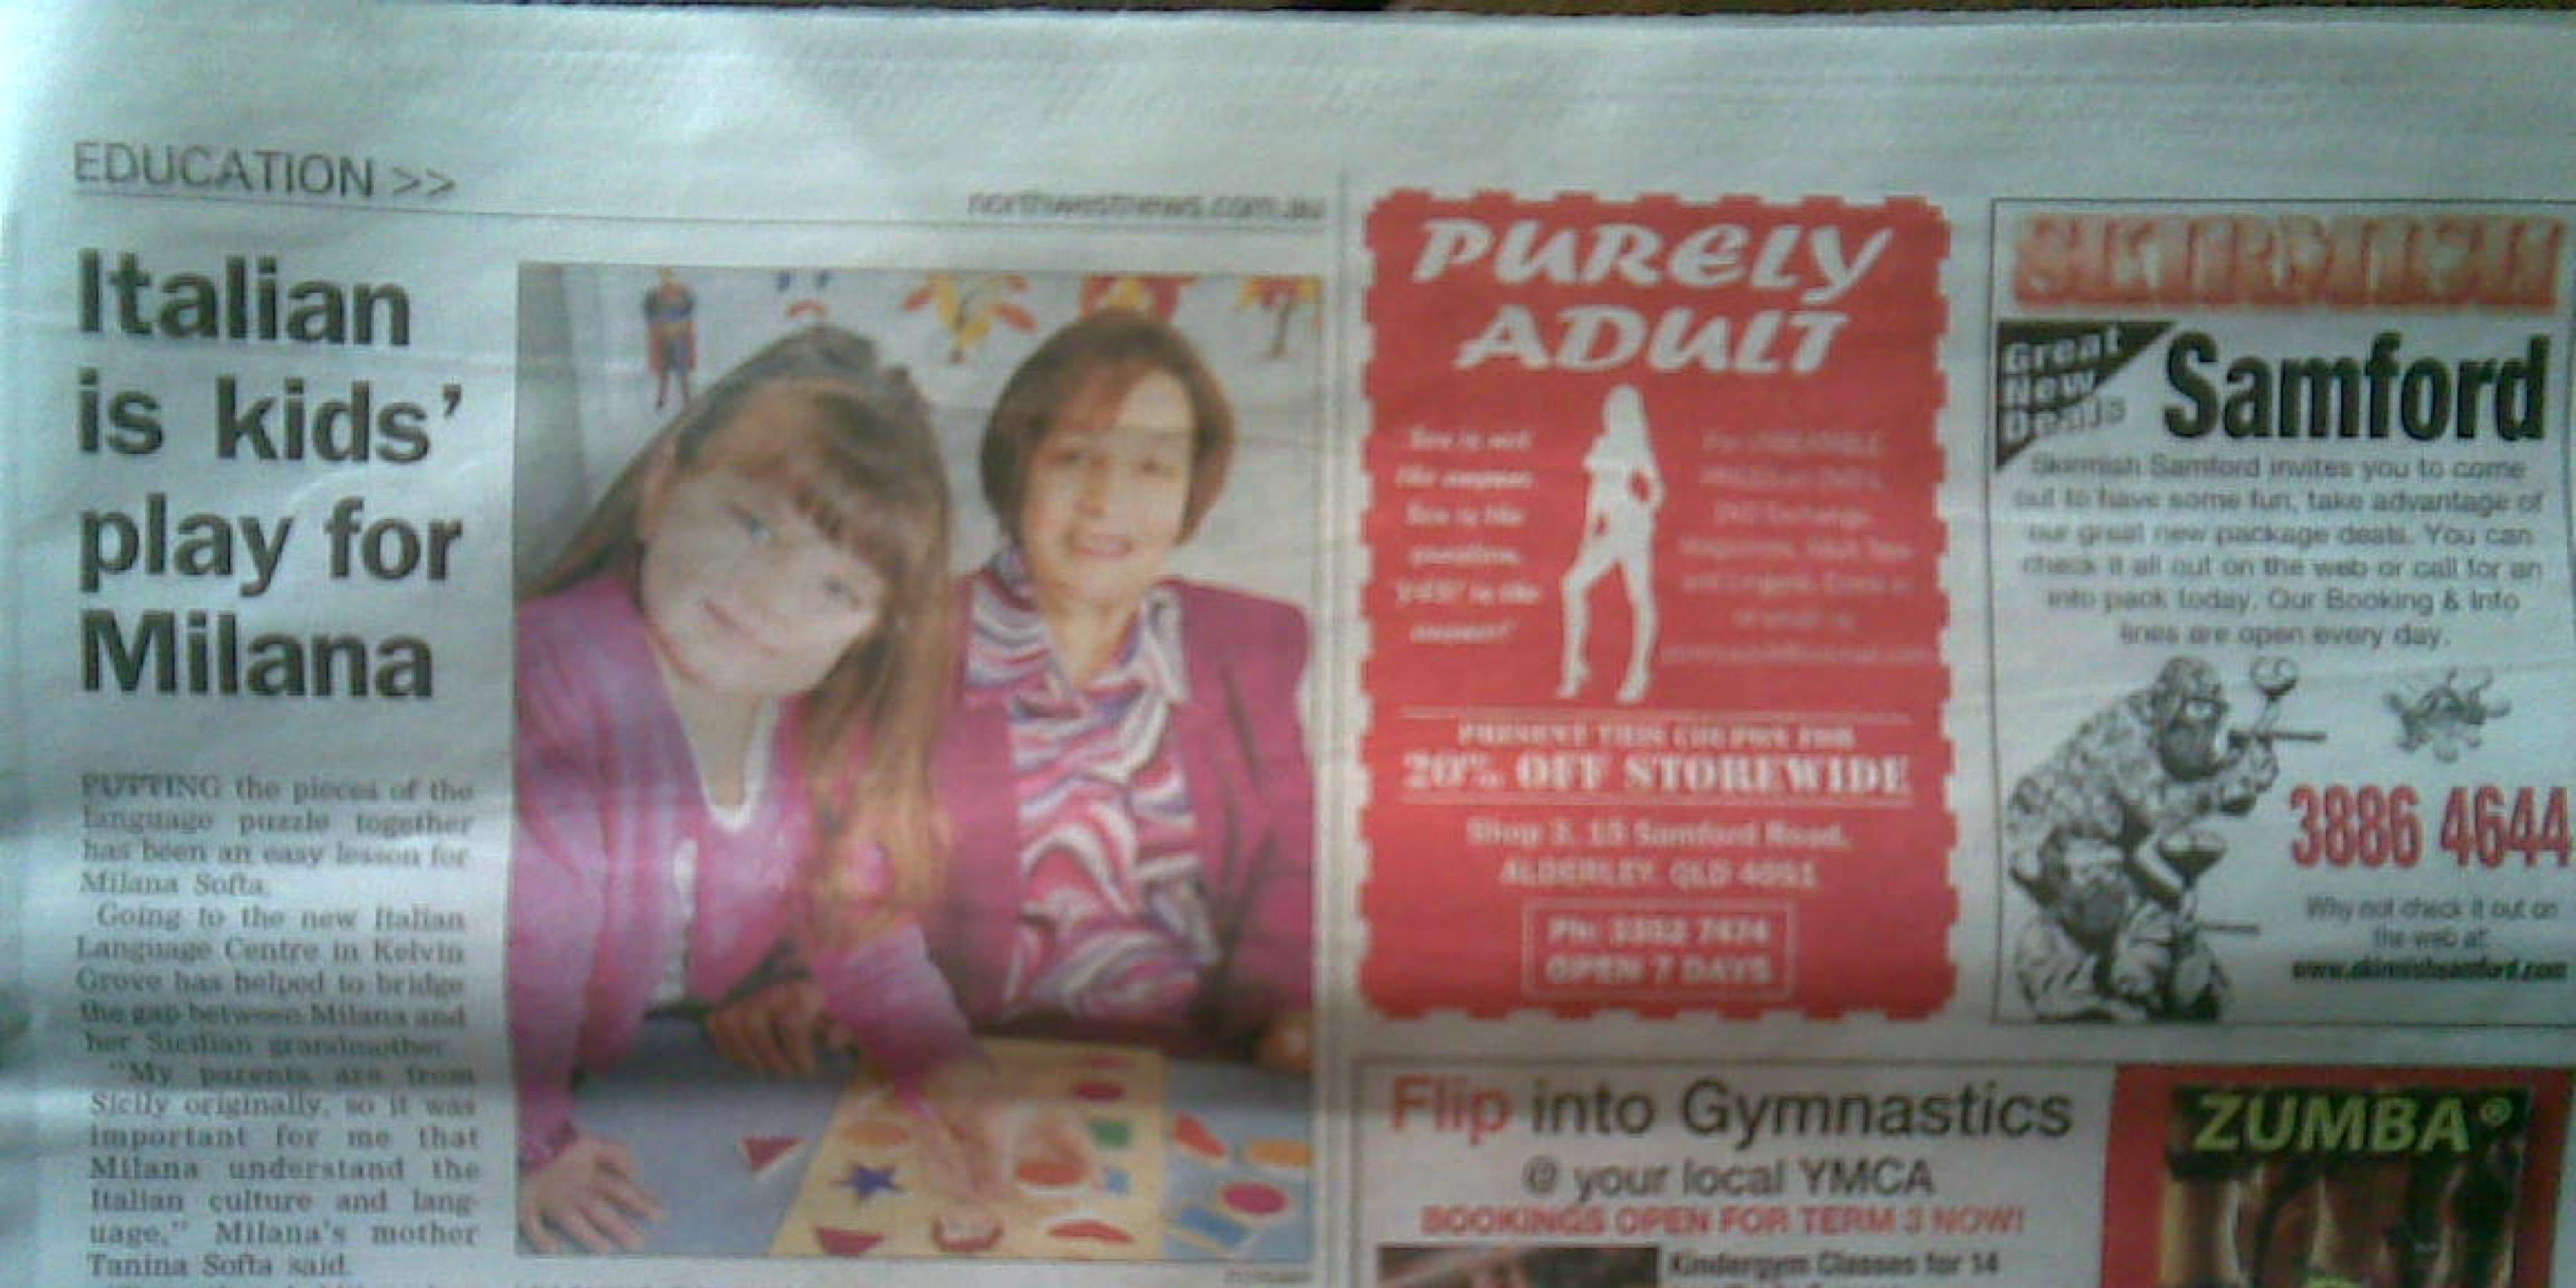 Letter challenges newspaper's porn ad